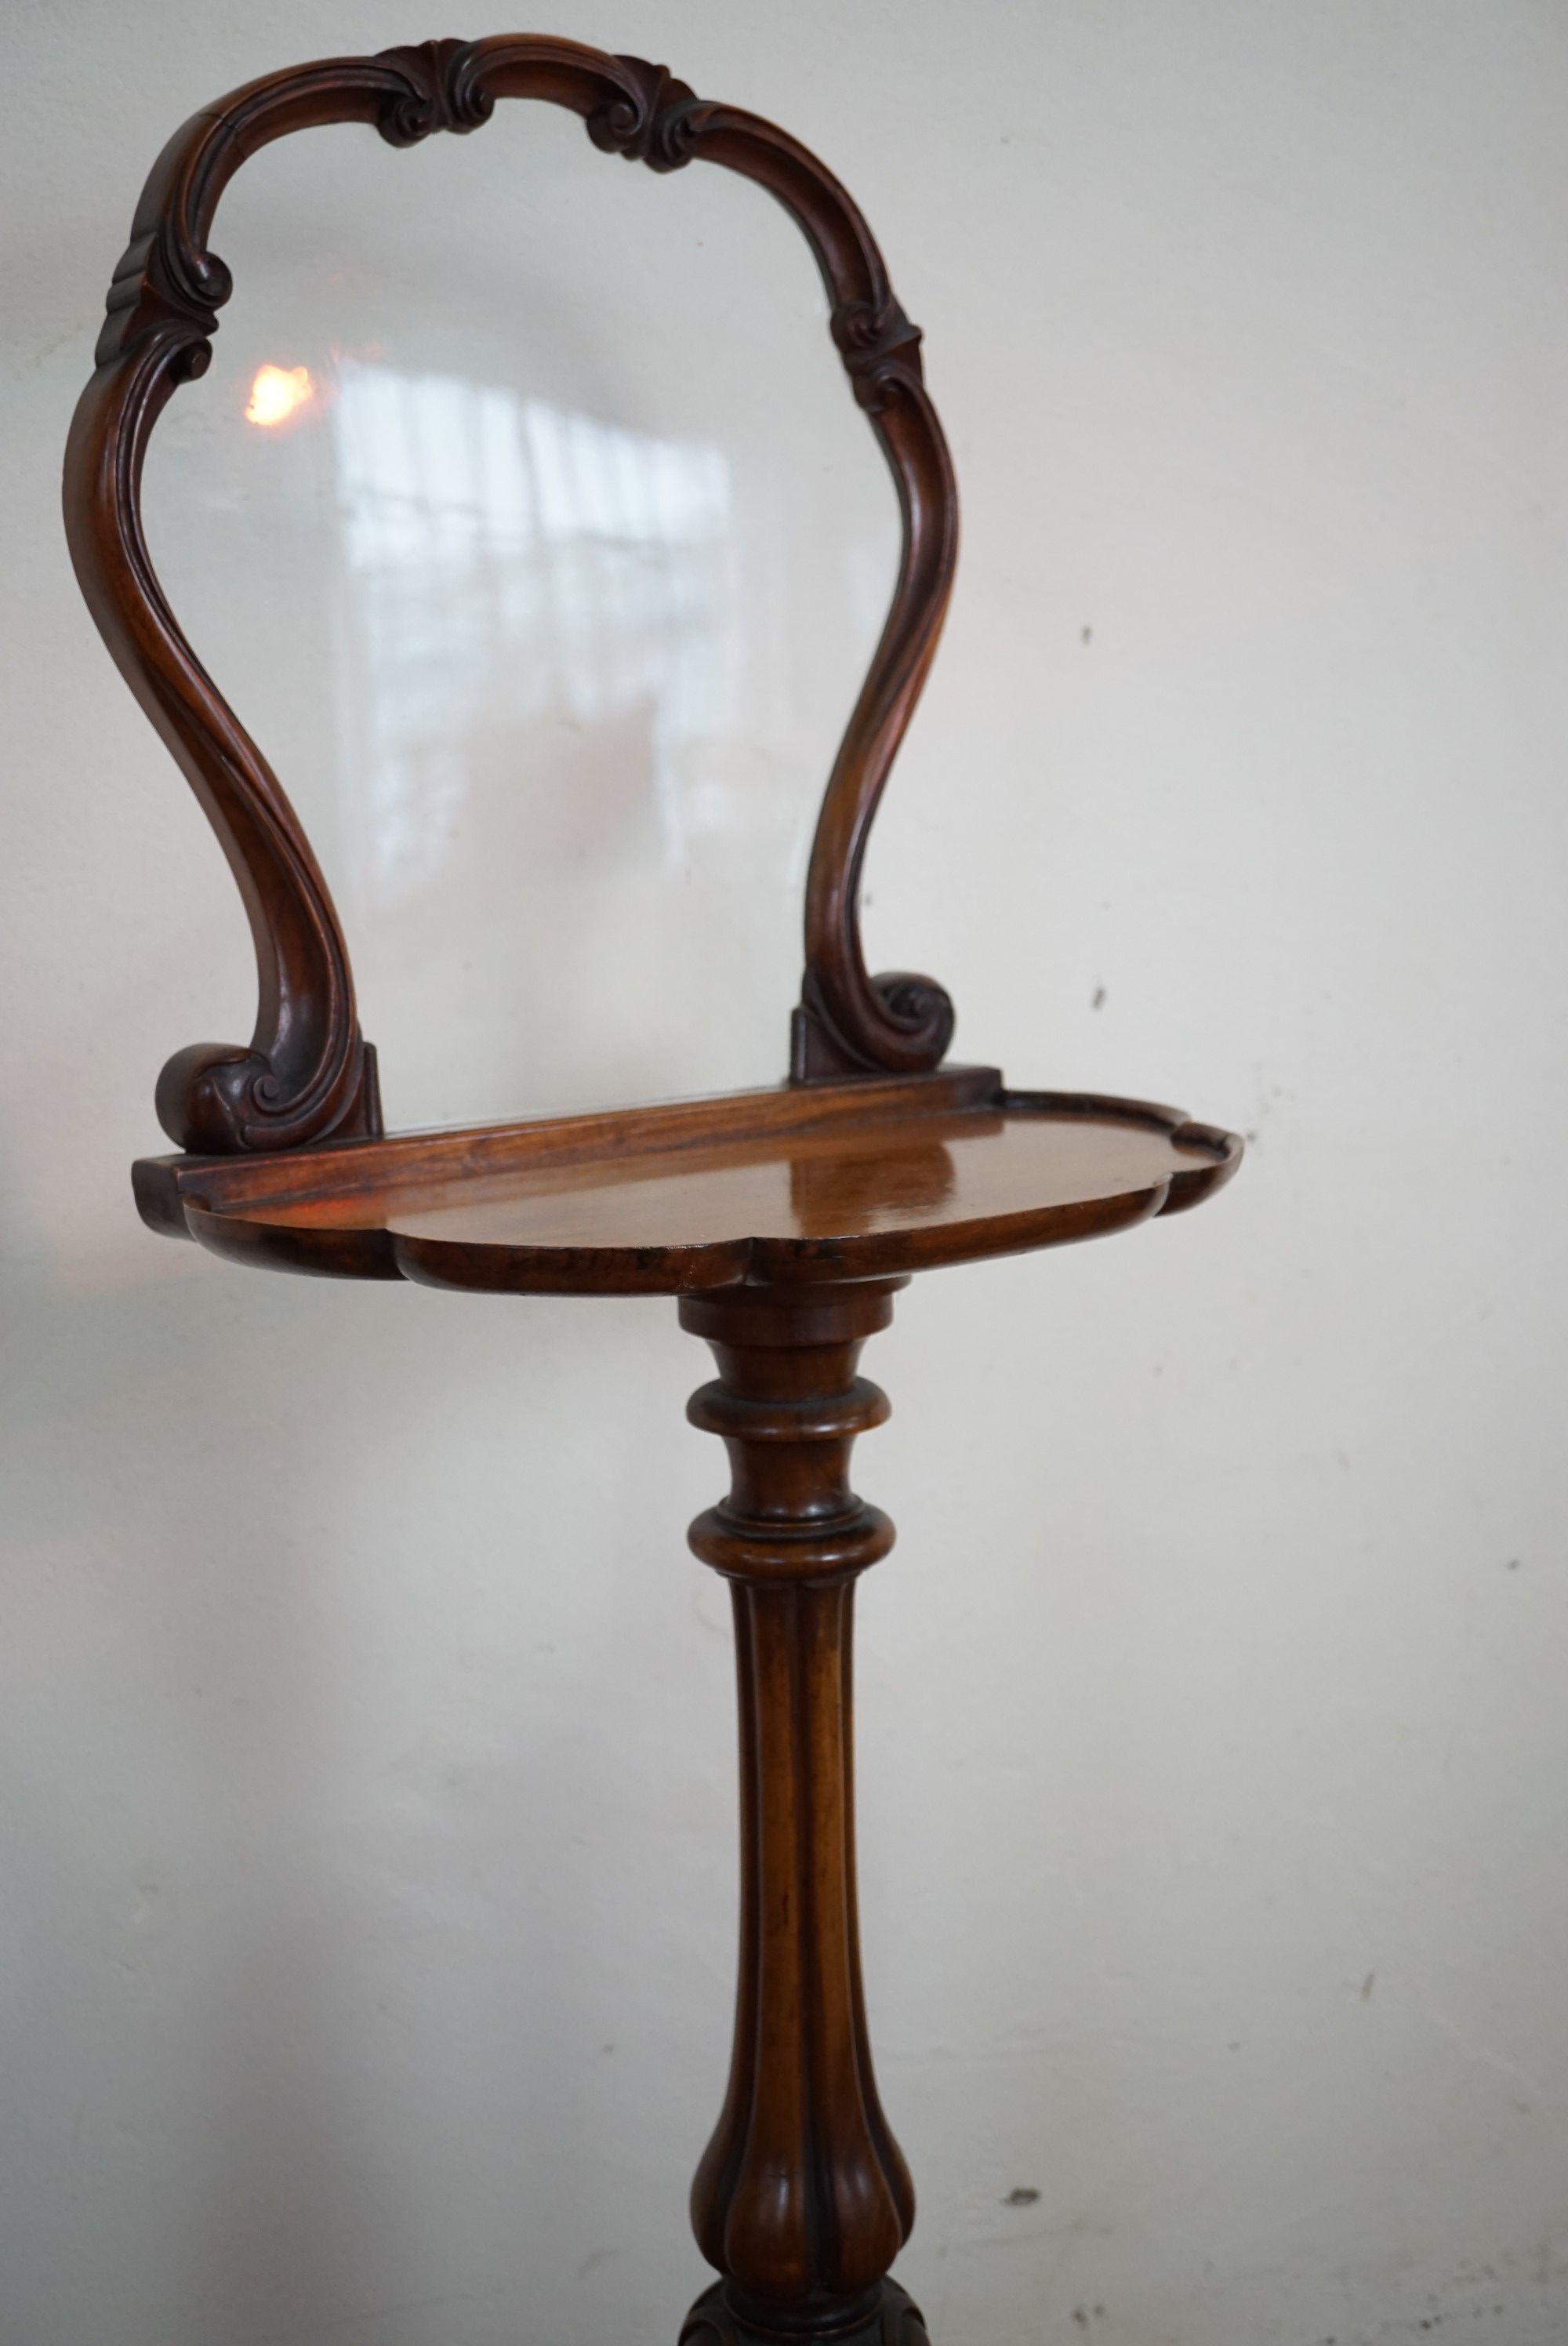 Lot 778 - A Victorian walnut tripod screen with shelf, 110 cm